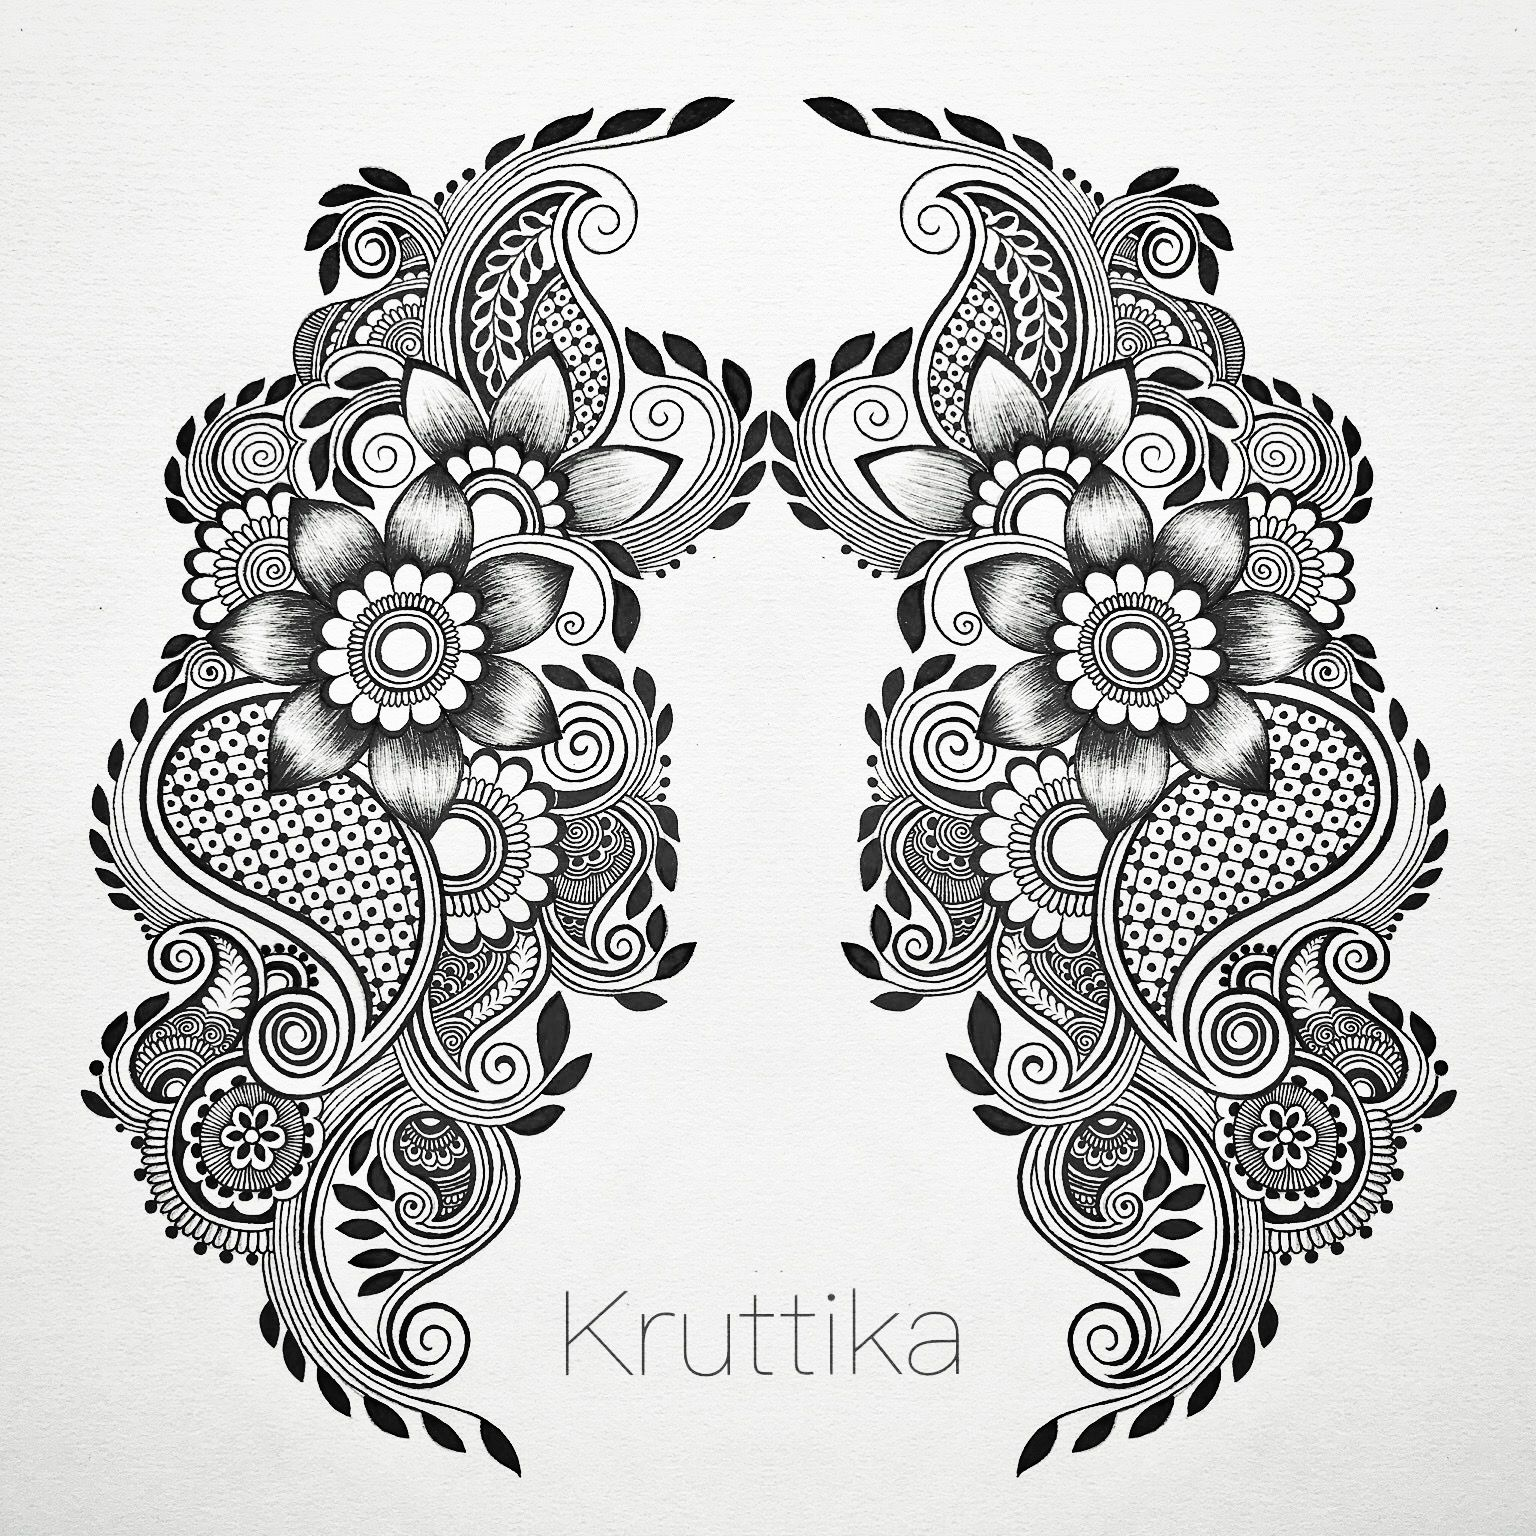 Freehand Symmetrical Designs Design Ideas Hand Drawn